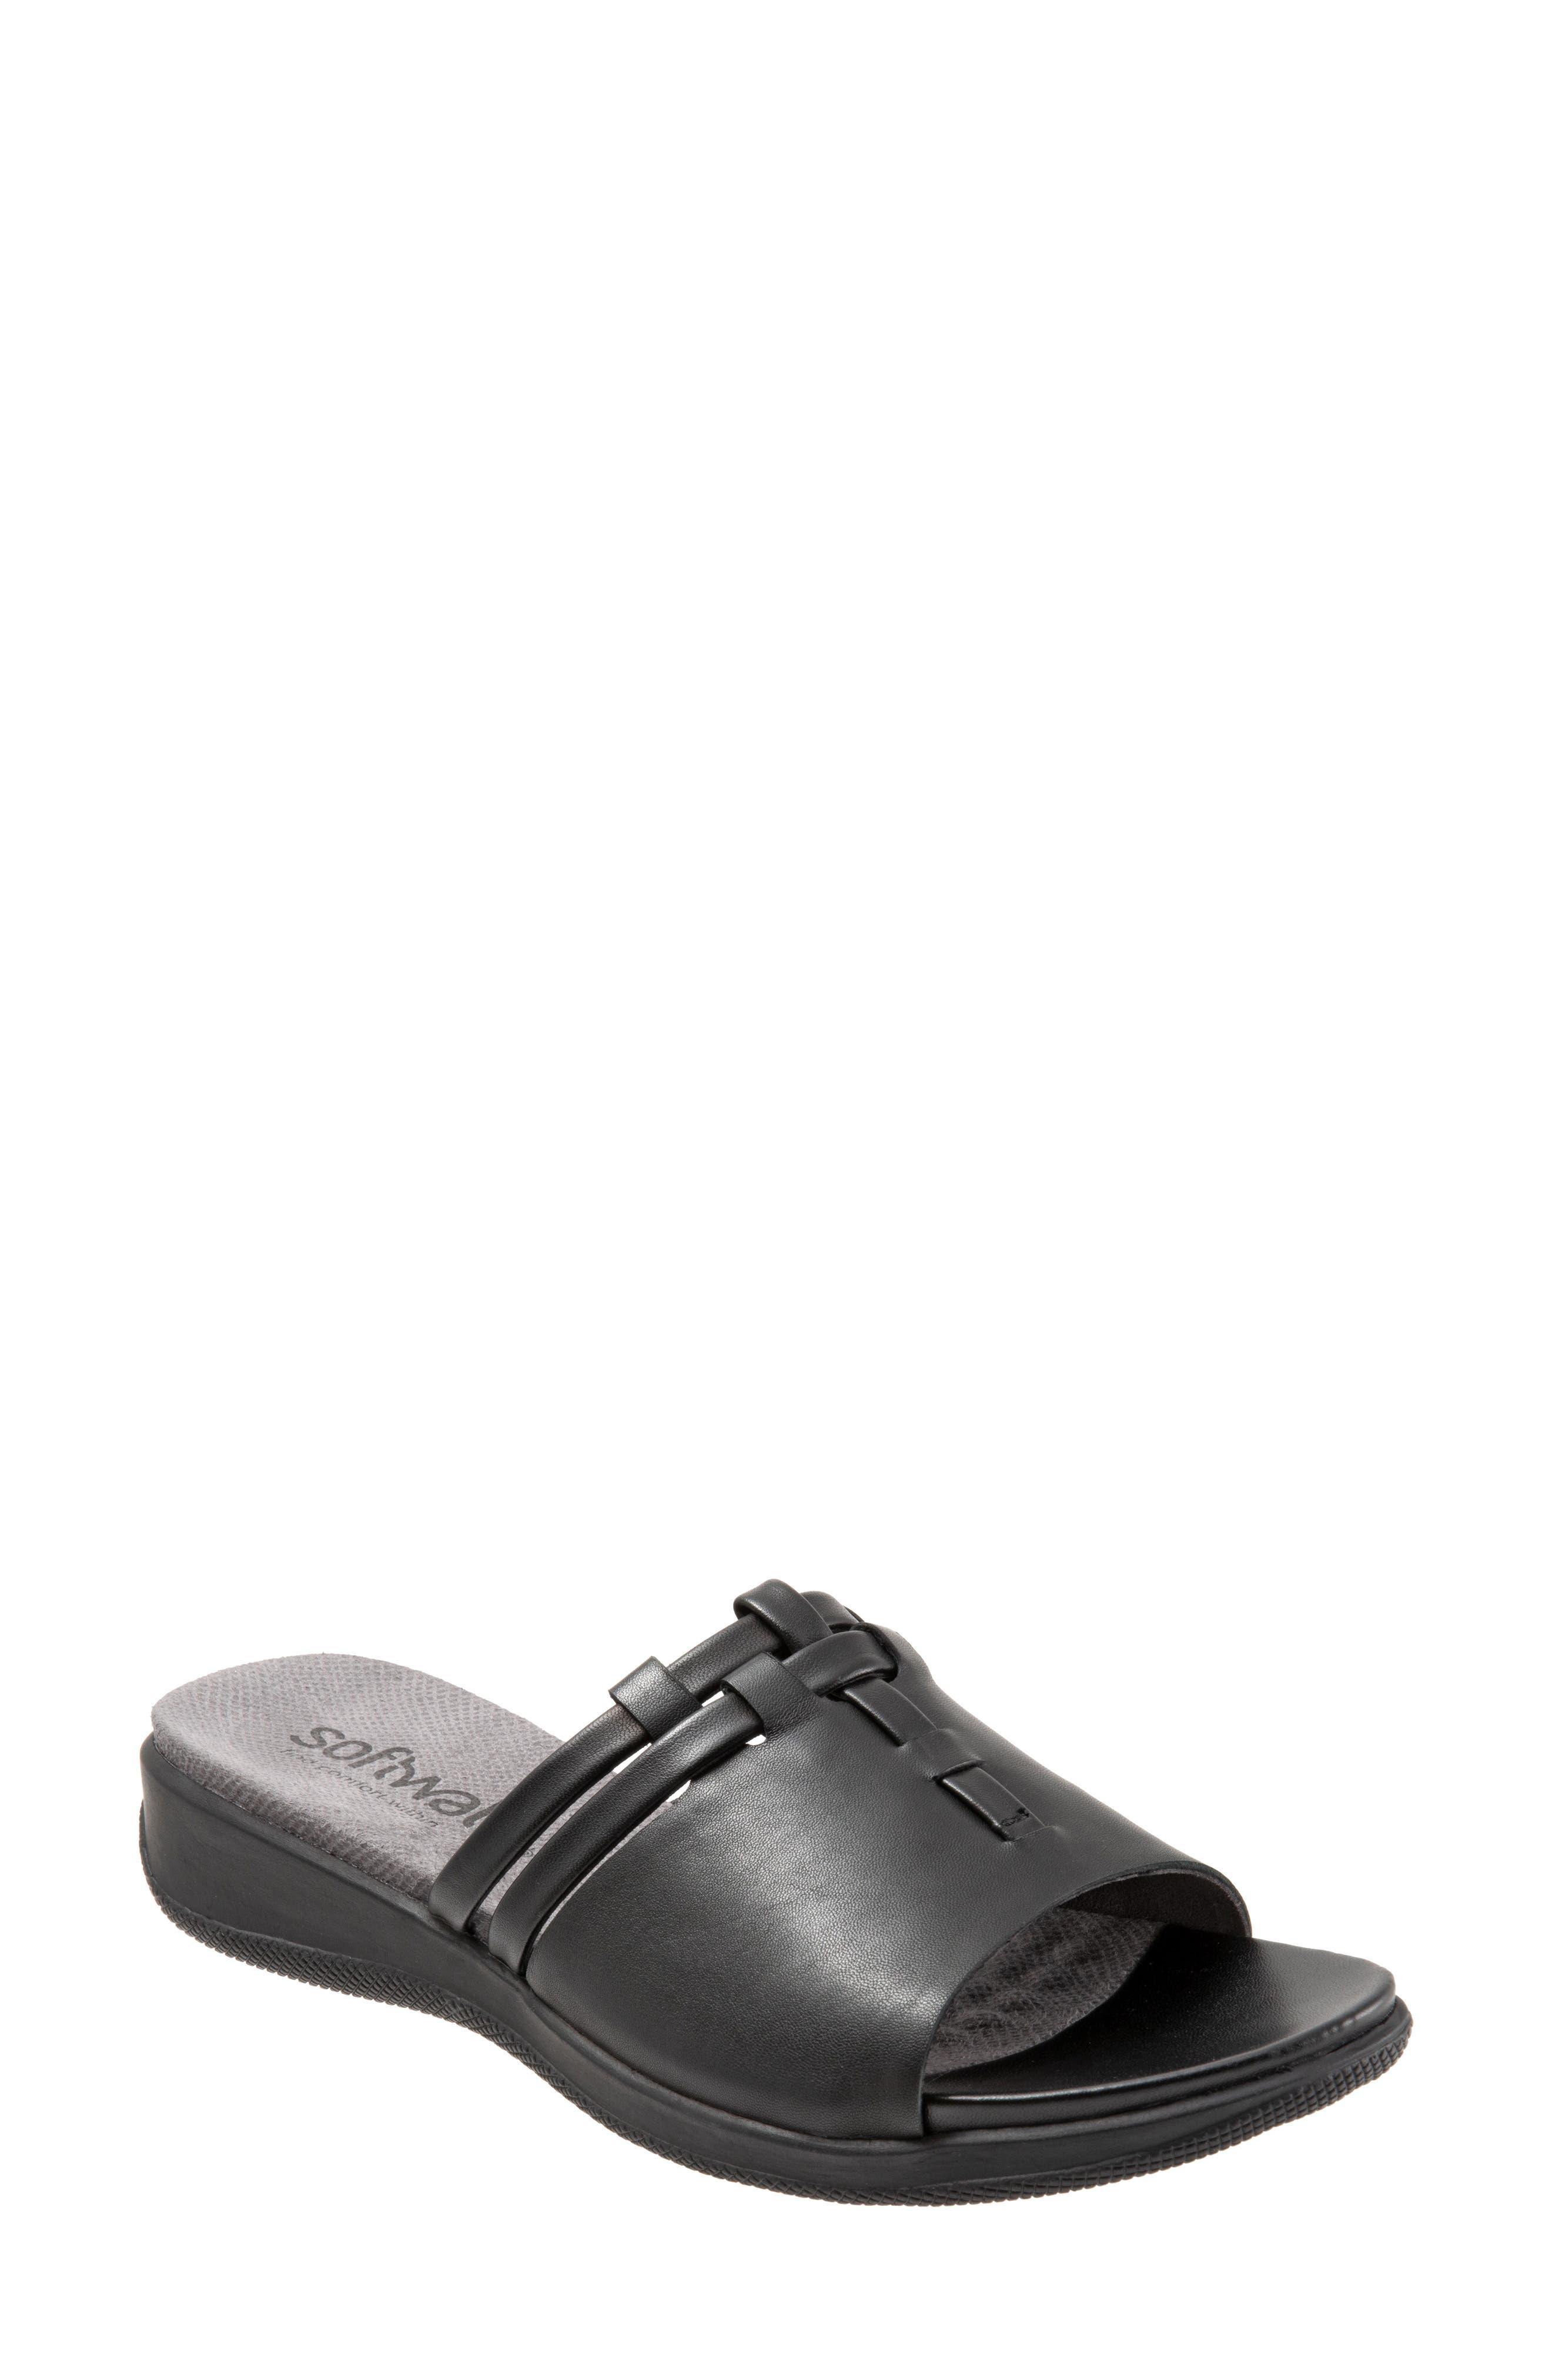 SOFTWALK<SUP>®</SUP>, Tahoma Woven Slide Sandal, Main thumbnail 1, color, BLACK LEATHER